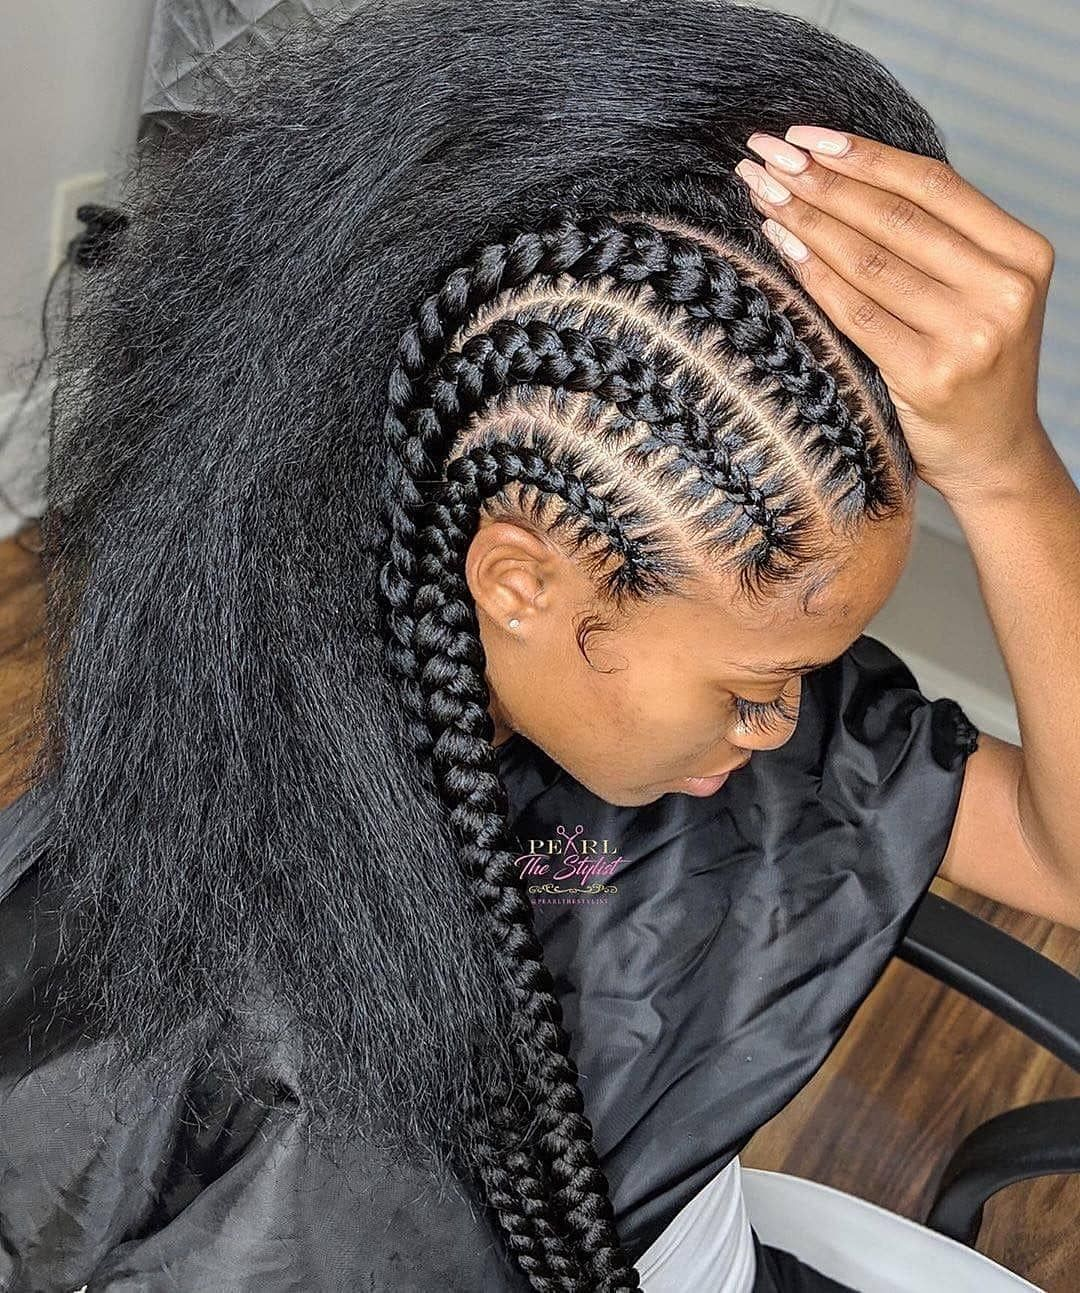 5 Packs Jumbo Box Braids Hair Feed In Braids Hairstyles Braided Hairstyles Natural Hair Styles